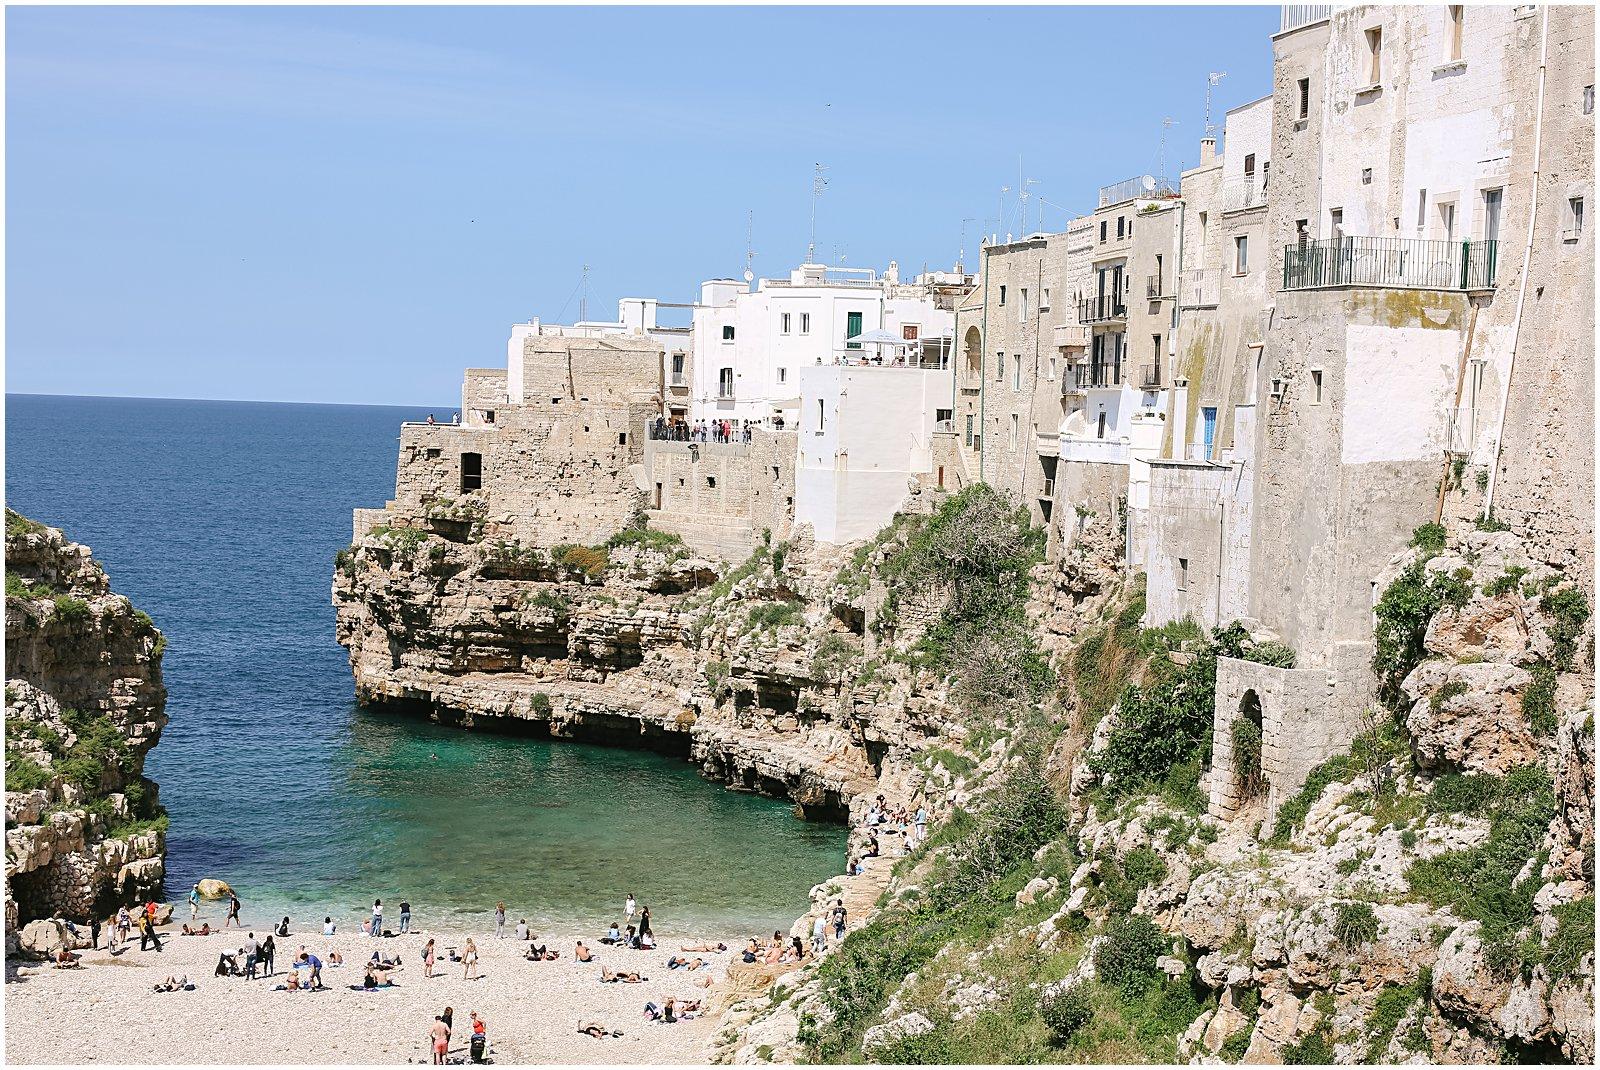 polignano a mare italy coastline and cliffs